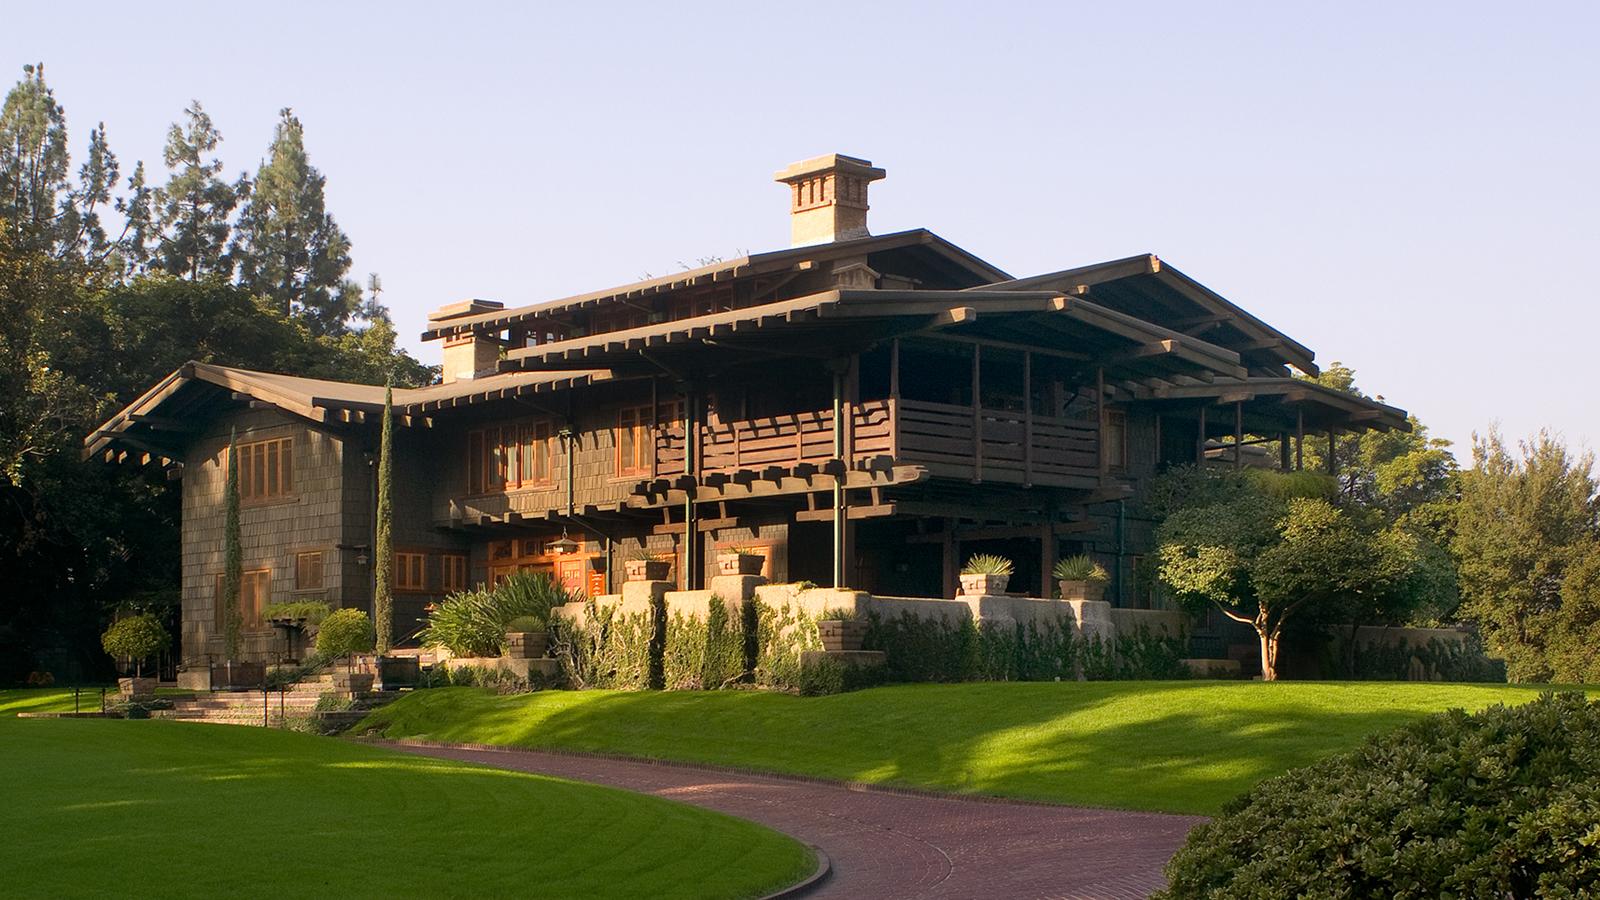 CA_Pasadena_GambleHouse-Garden_signature_AlexanderVertikoff_2007_02.jpg